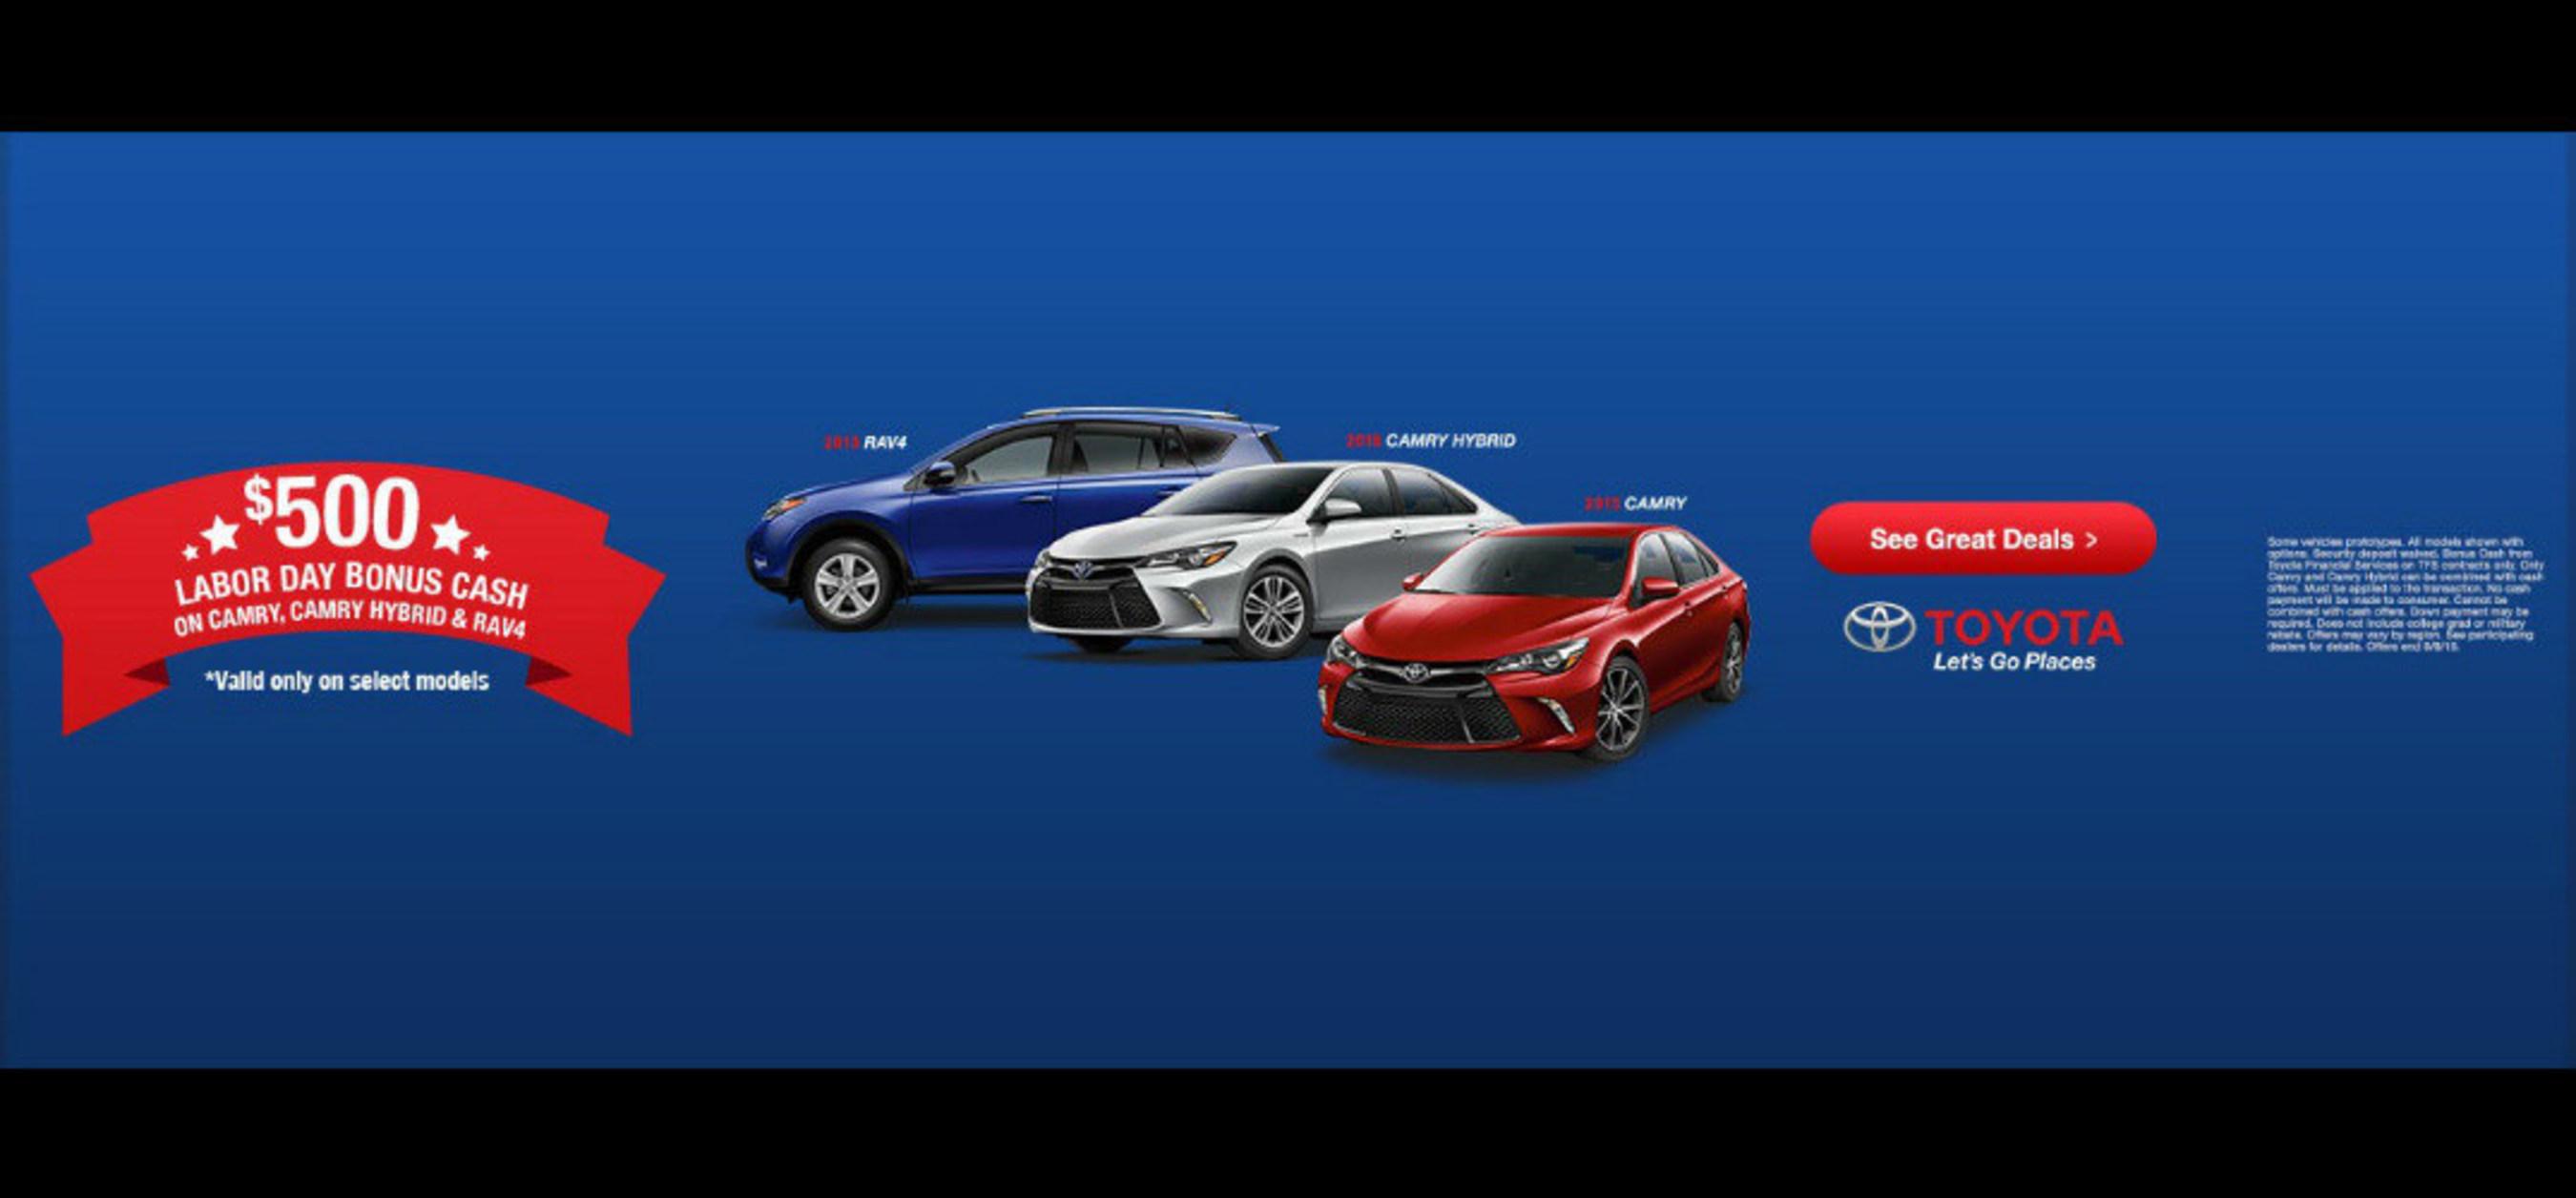 Toyota of Naperville offers Labor Day bonus